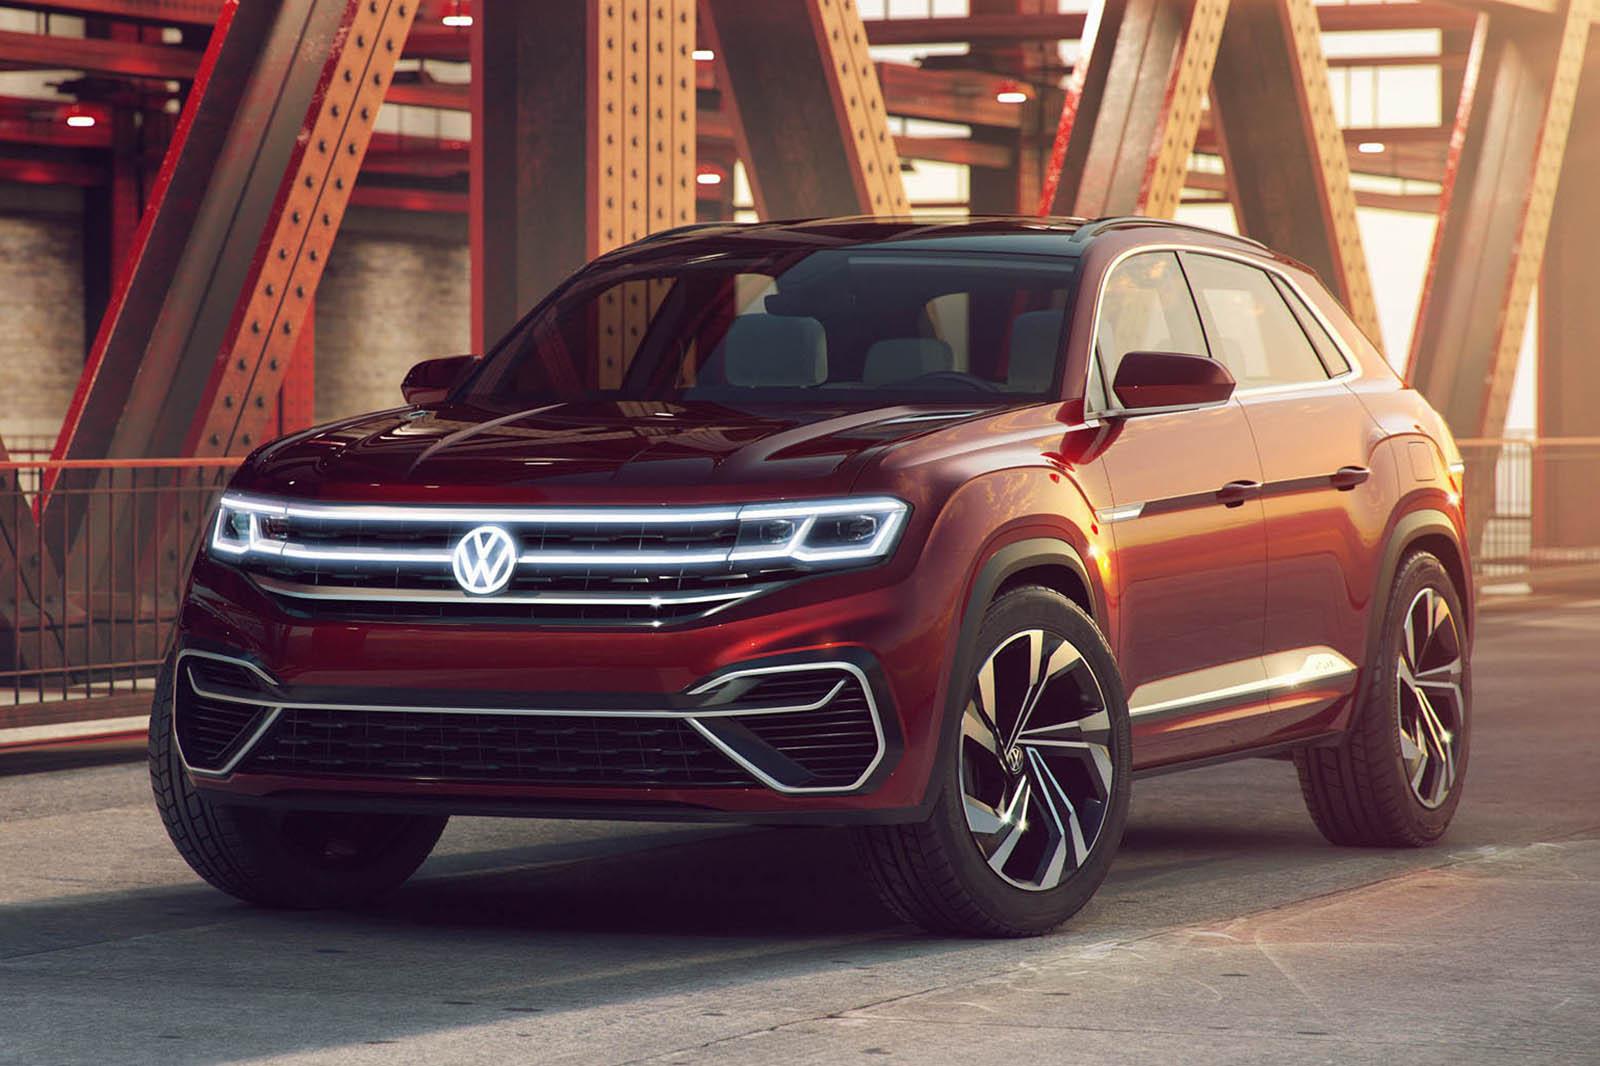 Концепция Volkswagen Atlas Cross Sport открыта